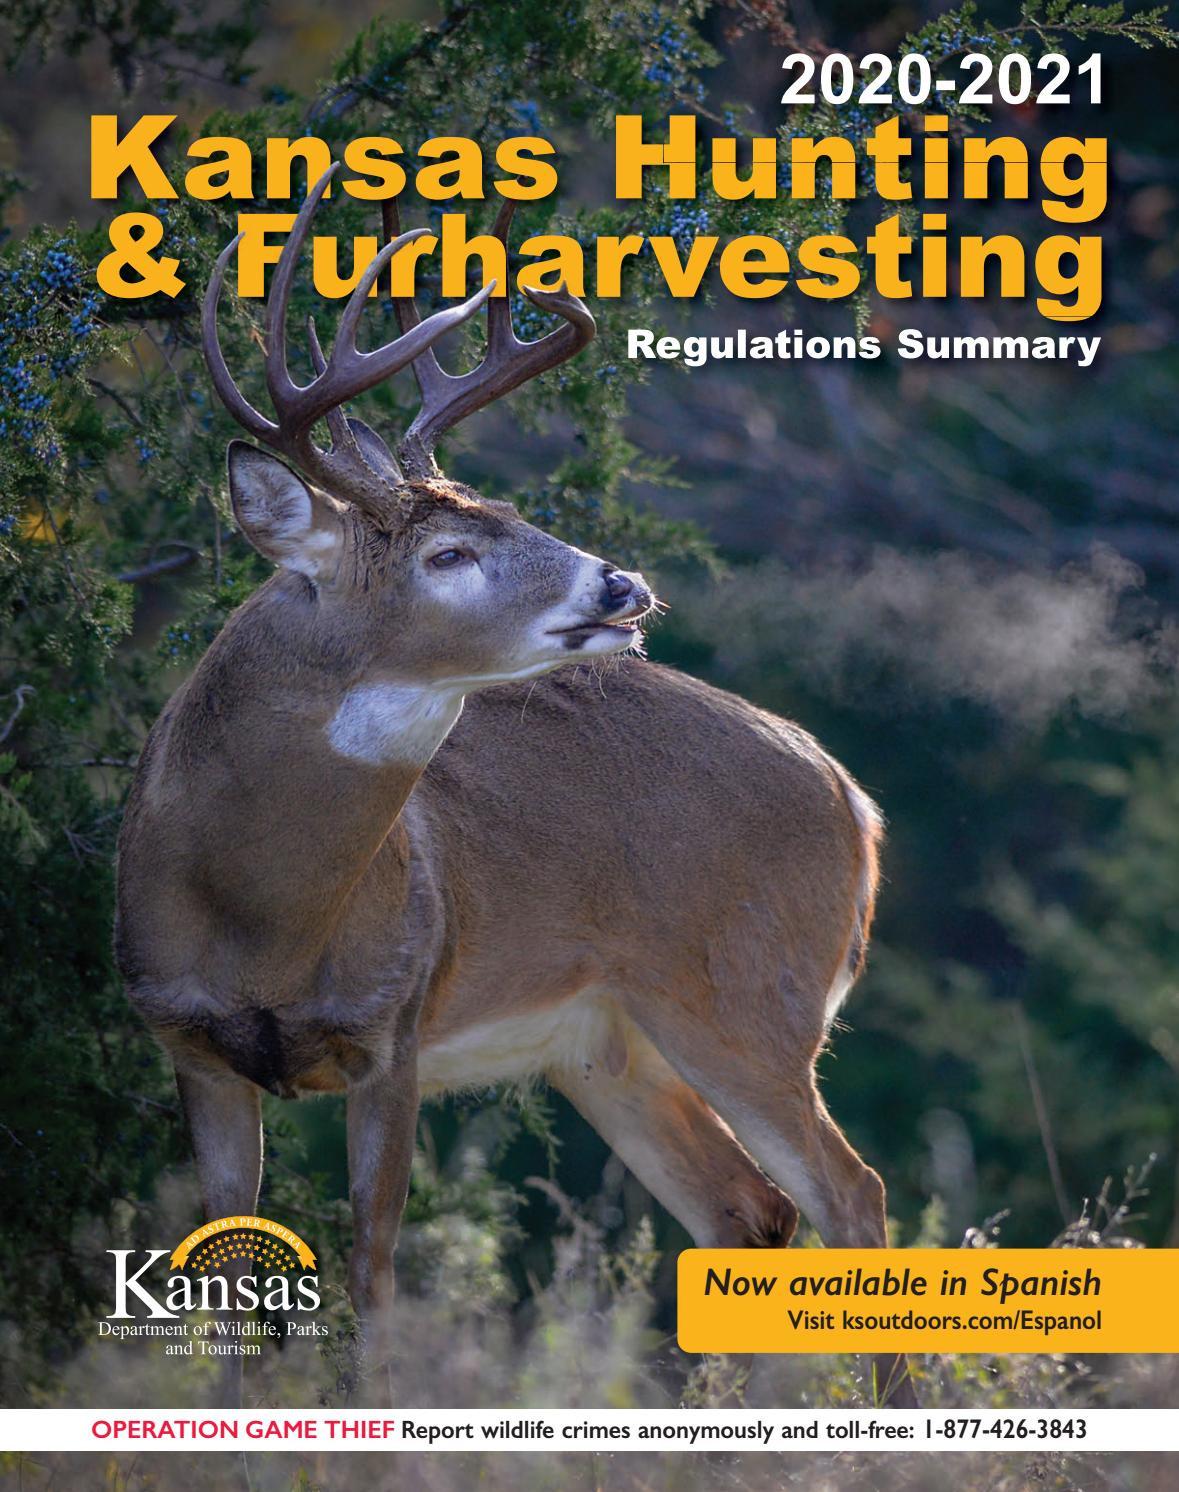 2021 Whitetail Deer Rut Predictions | Calendar Template-2021 Whitetail Rut Callendar In Ohio